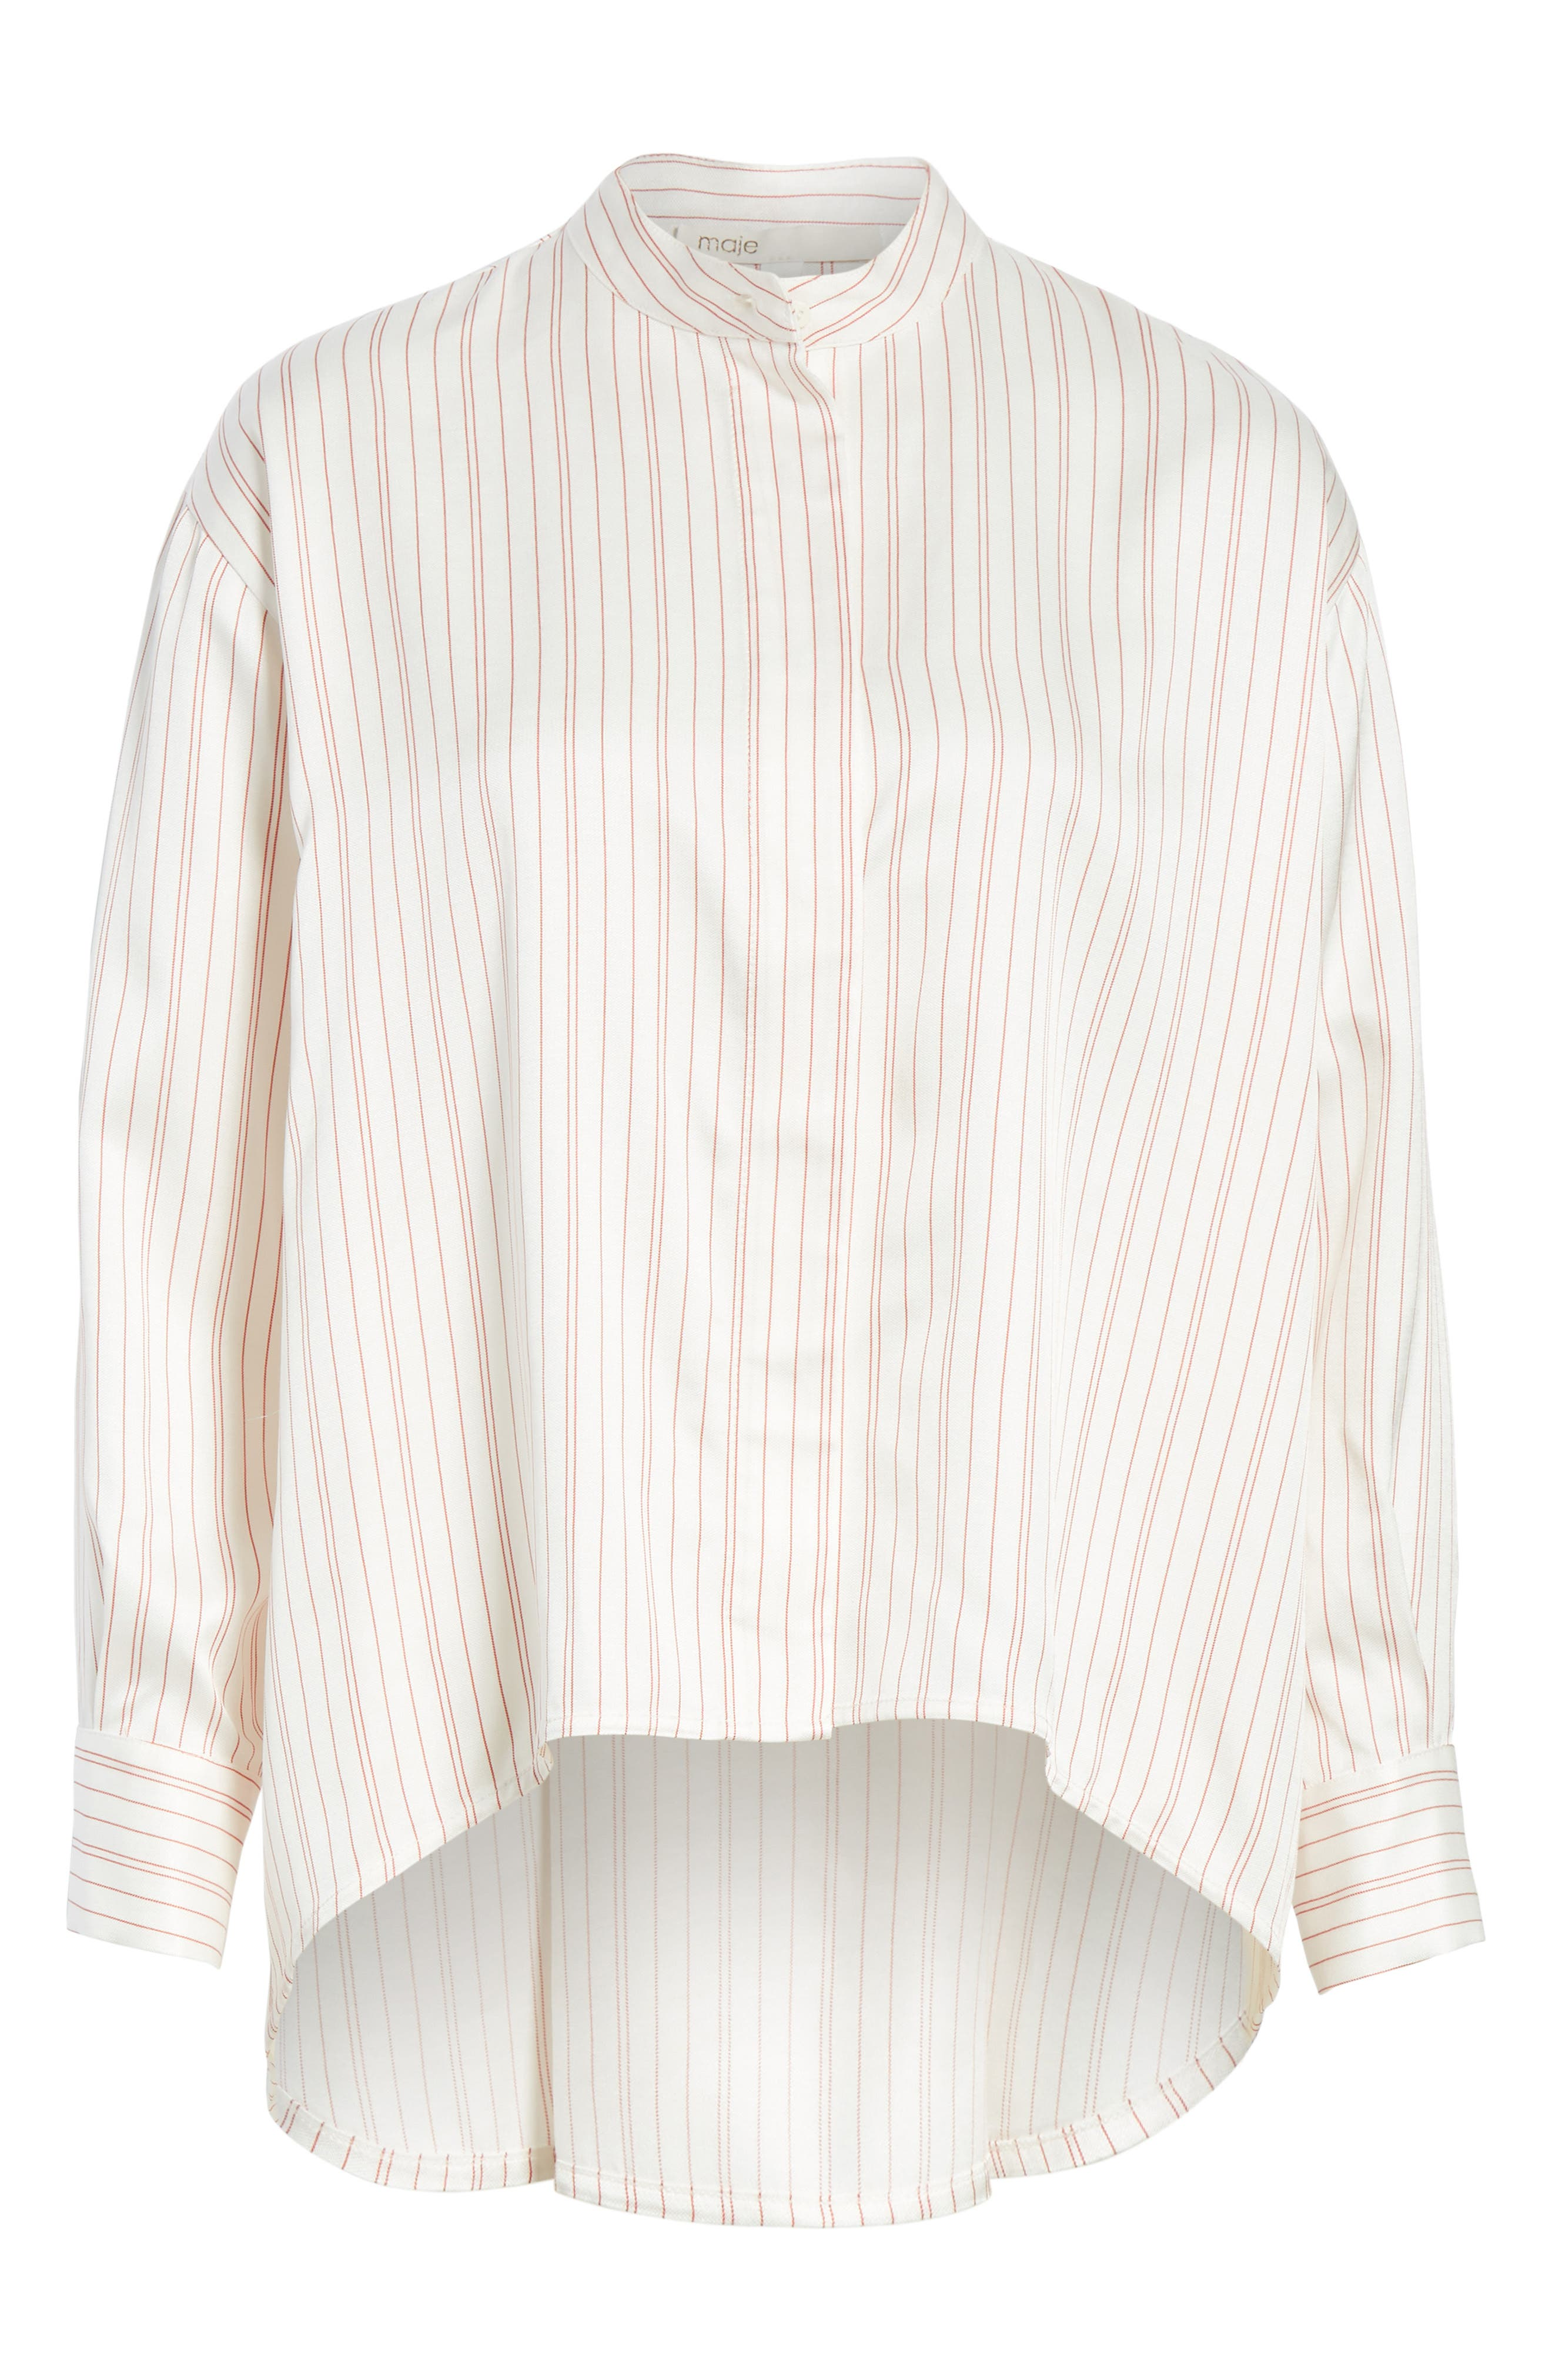 Stripe High/Low Blouse,                             Alternate thumbnail 6, color,                             100